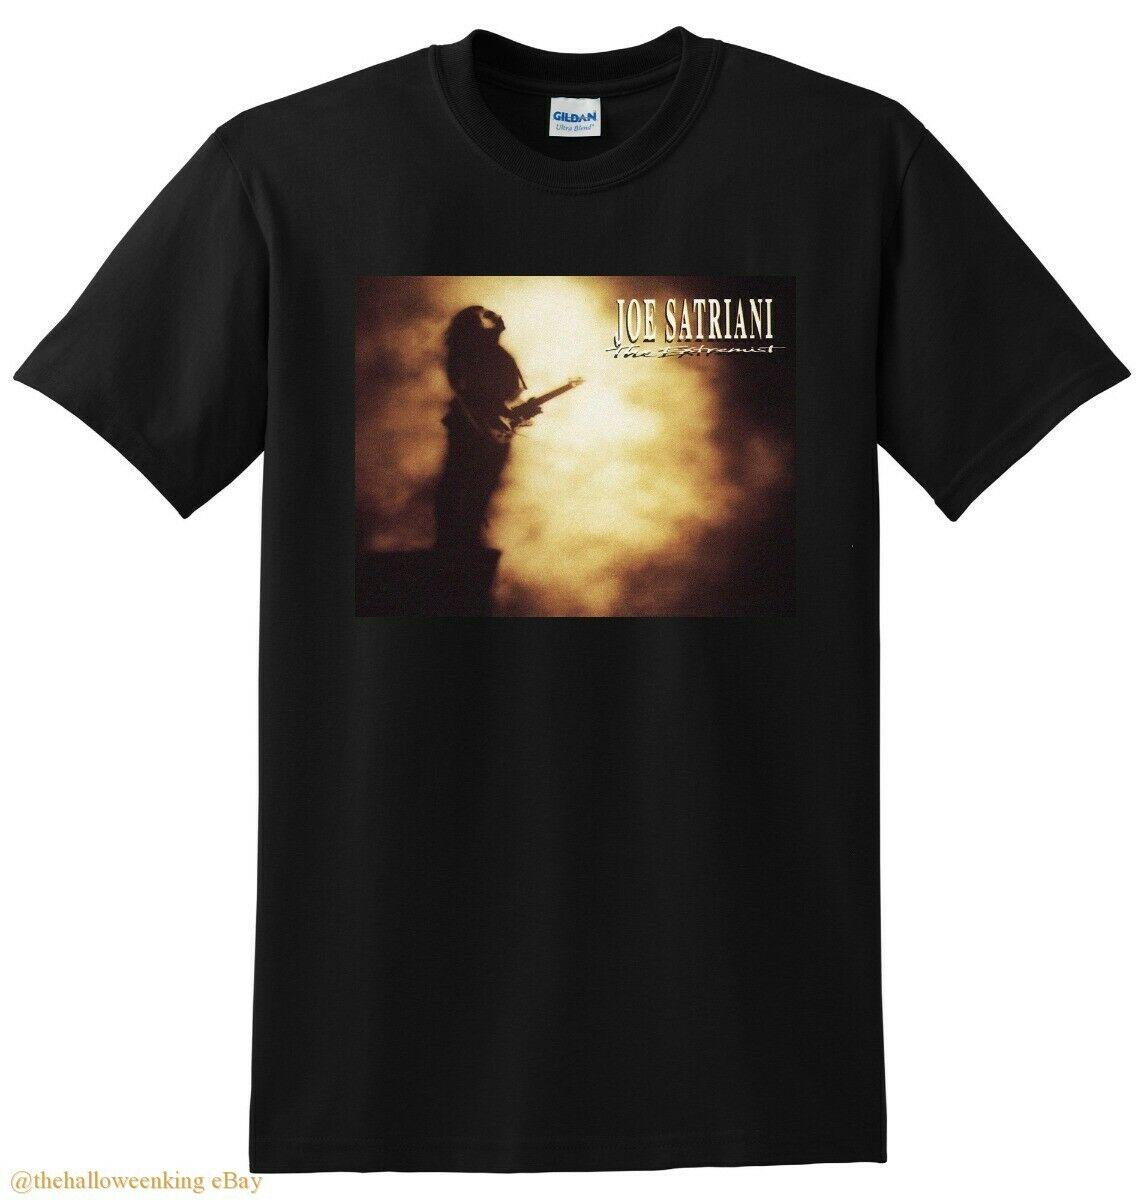 Joe satriani t camisa extremista vinil cd capa pequeno médio grande ou xl